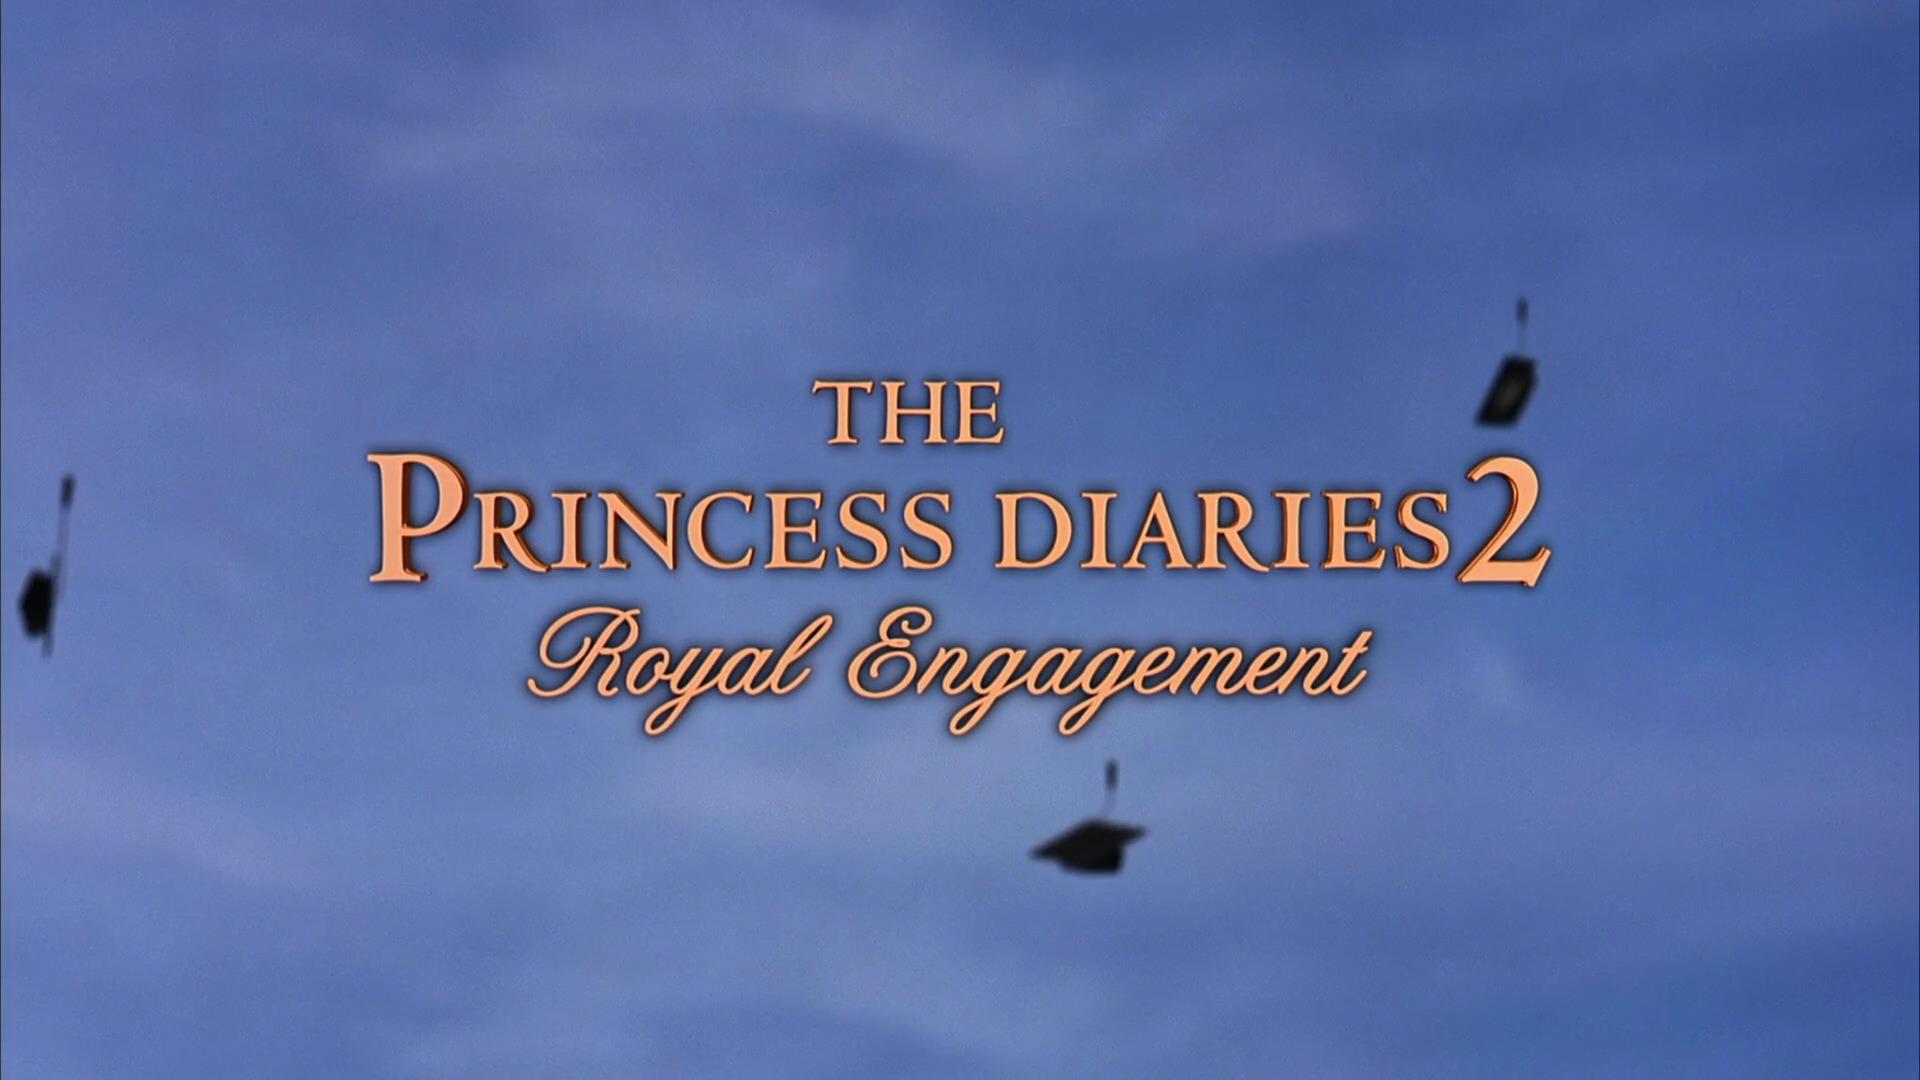 free download the princess diaries 2 royal engagement